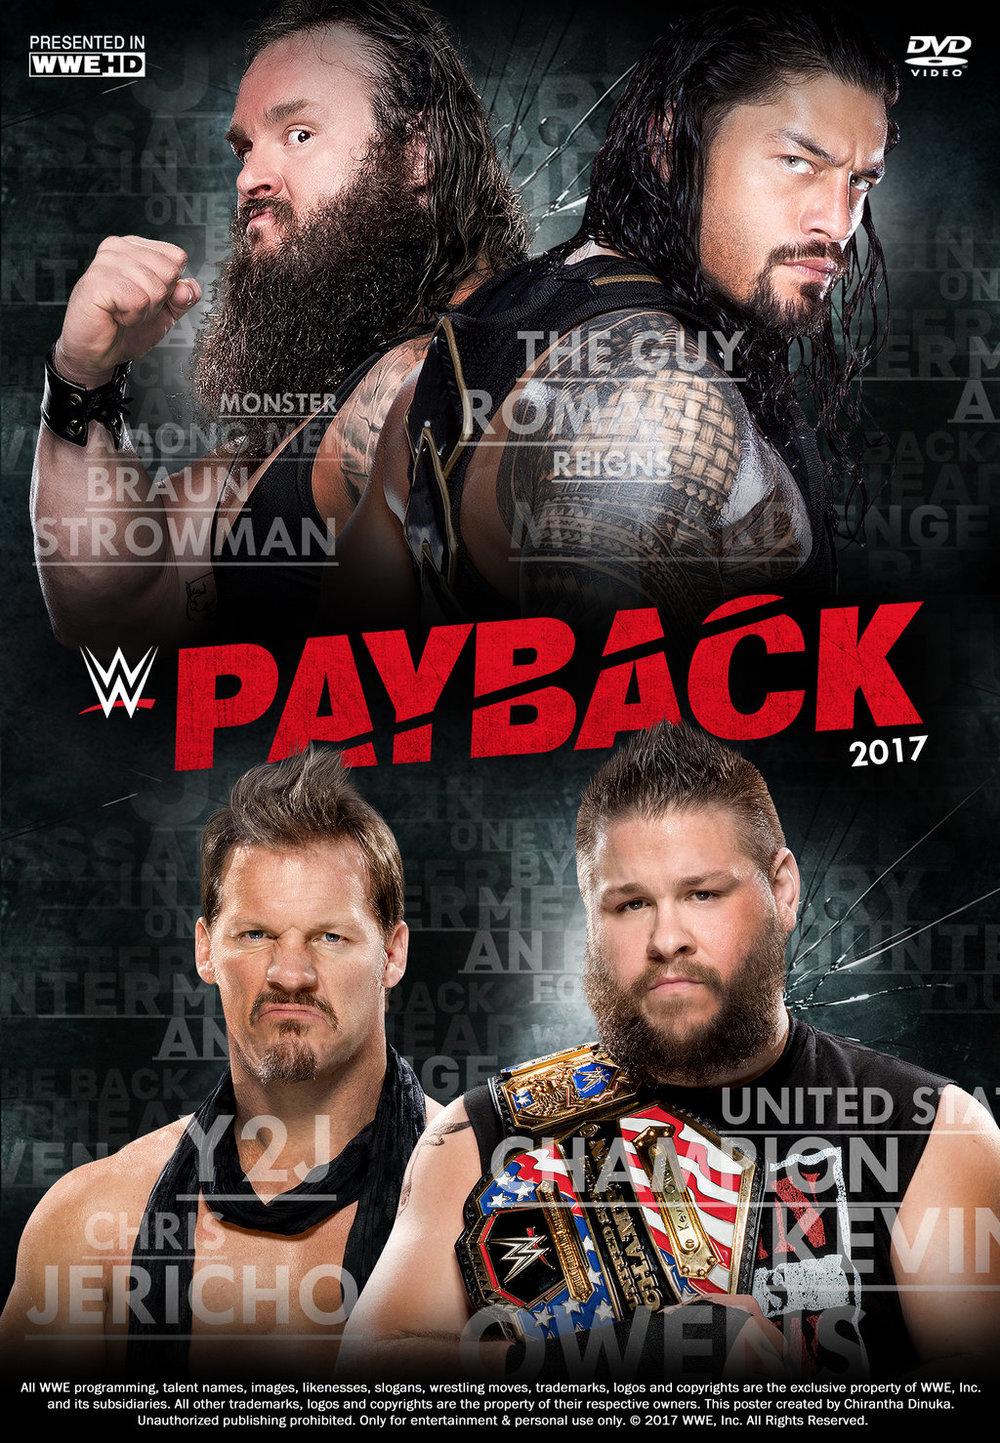 Payback poster.jpg